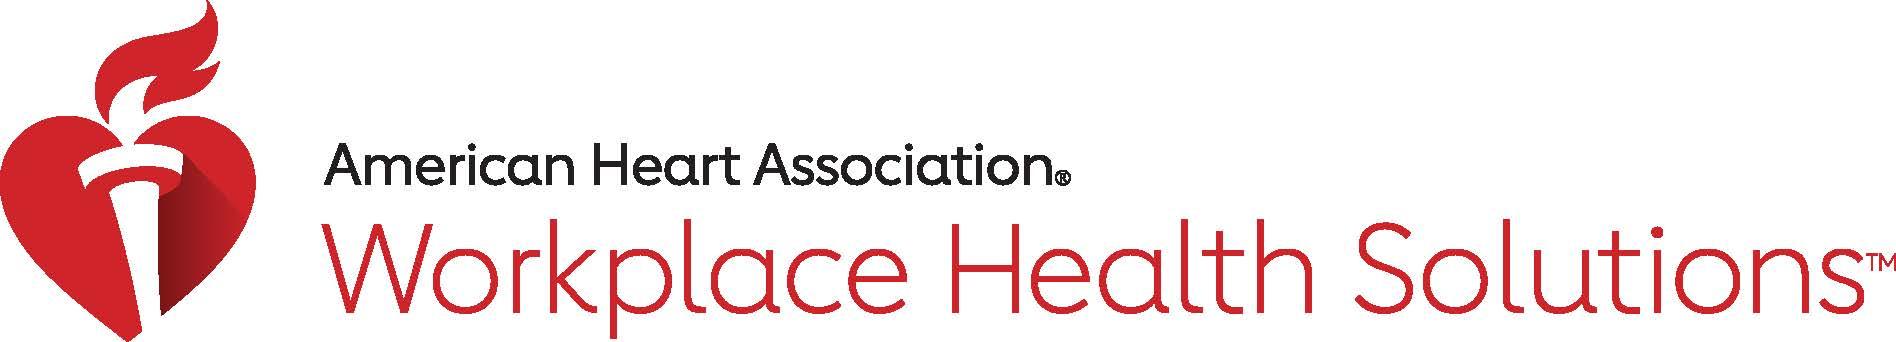 AHA Workplace Health Solutions Logo